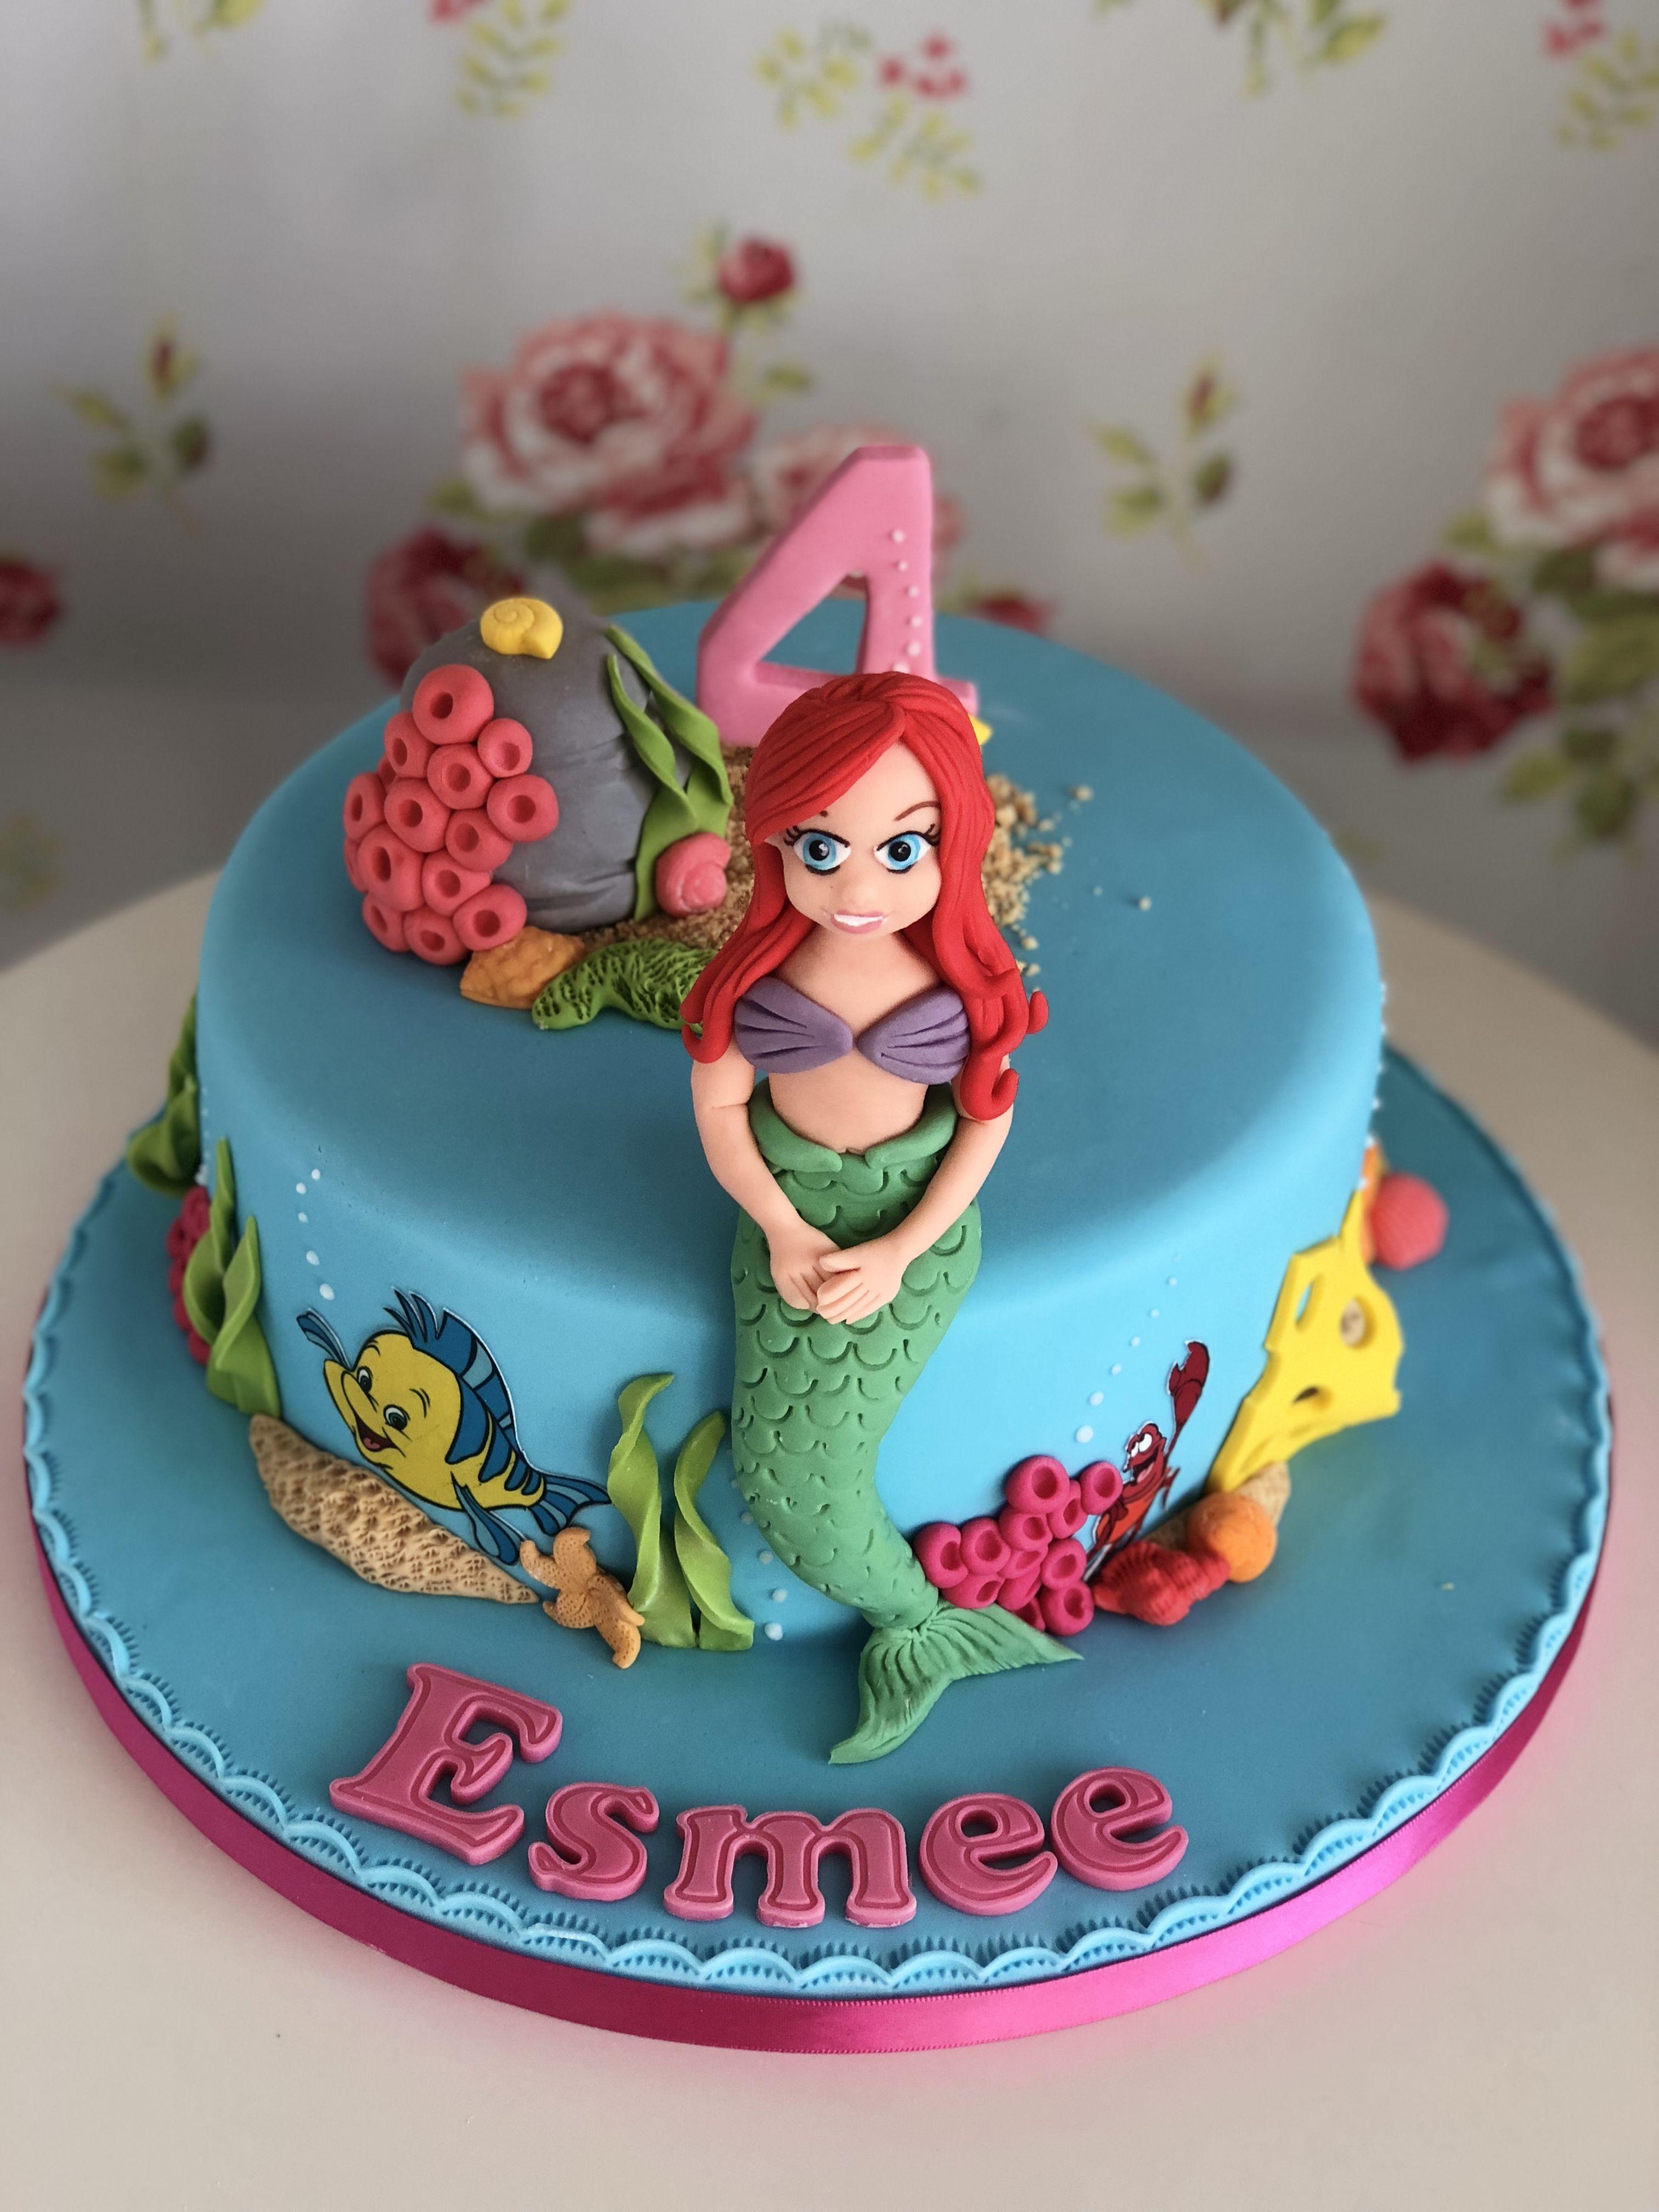 Ariel cake omg